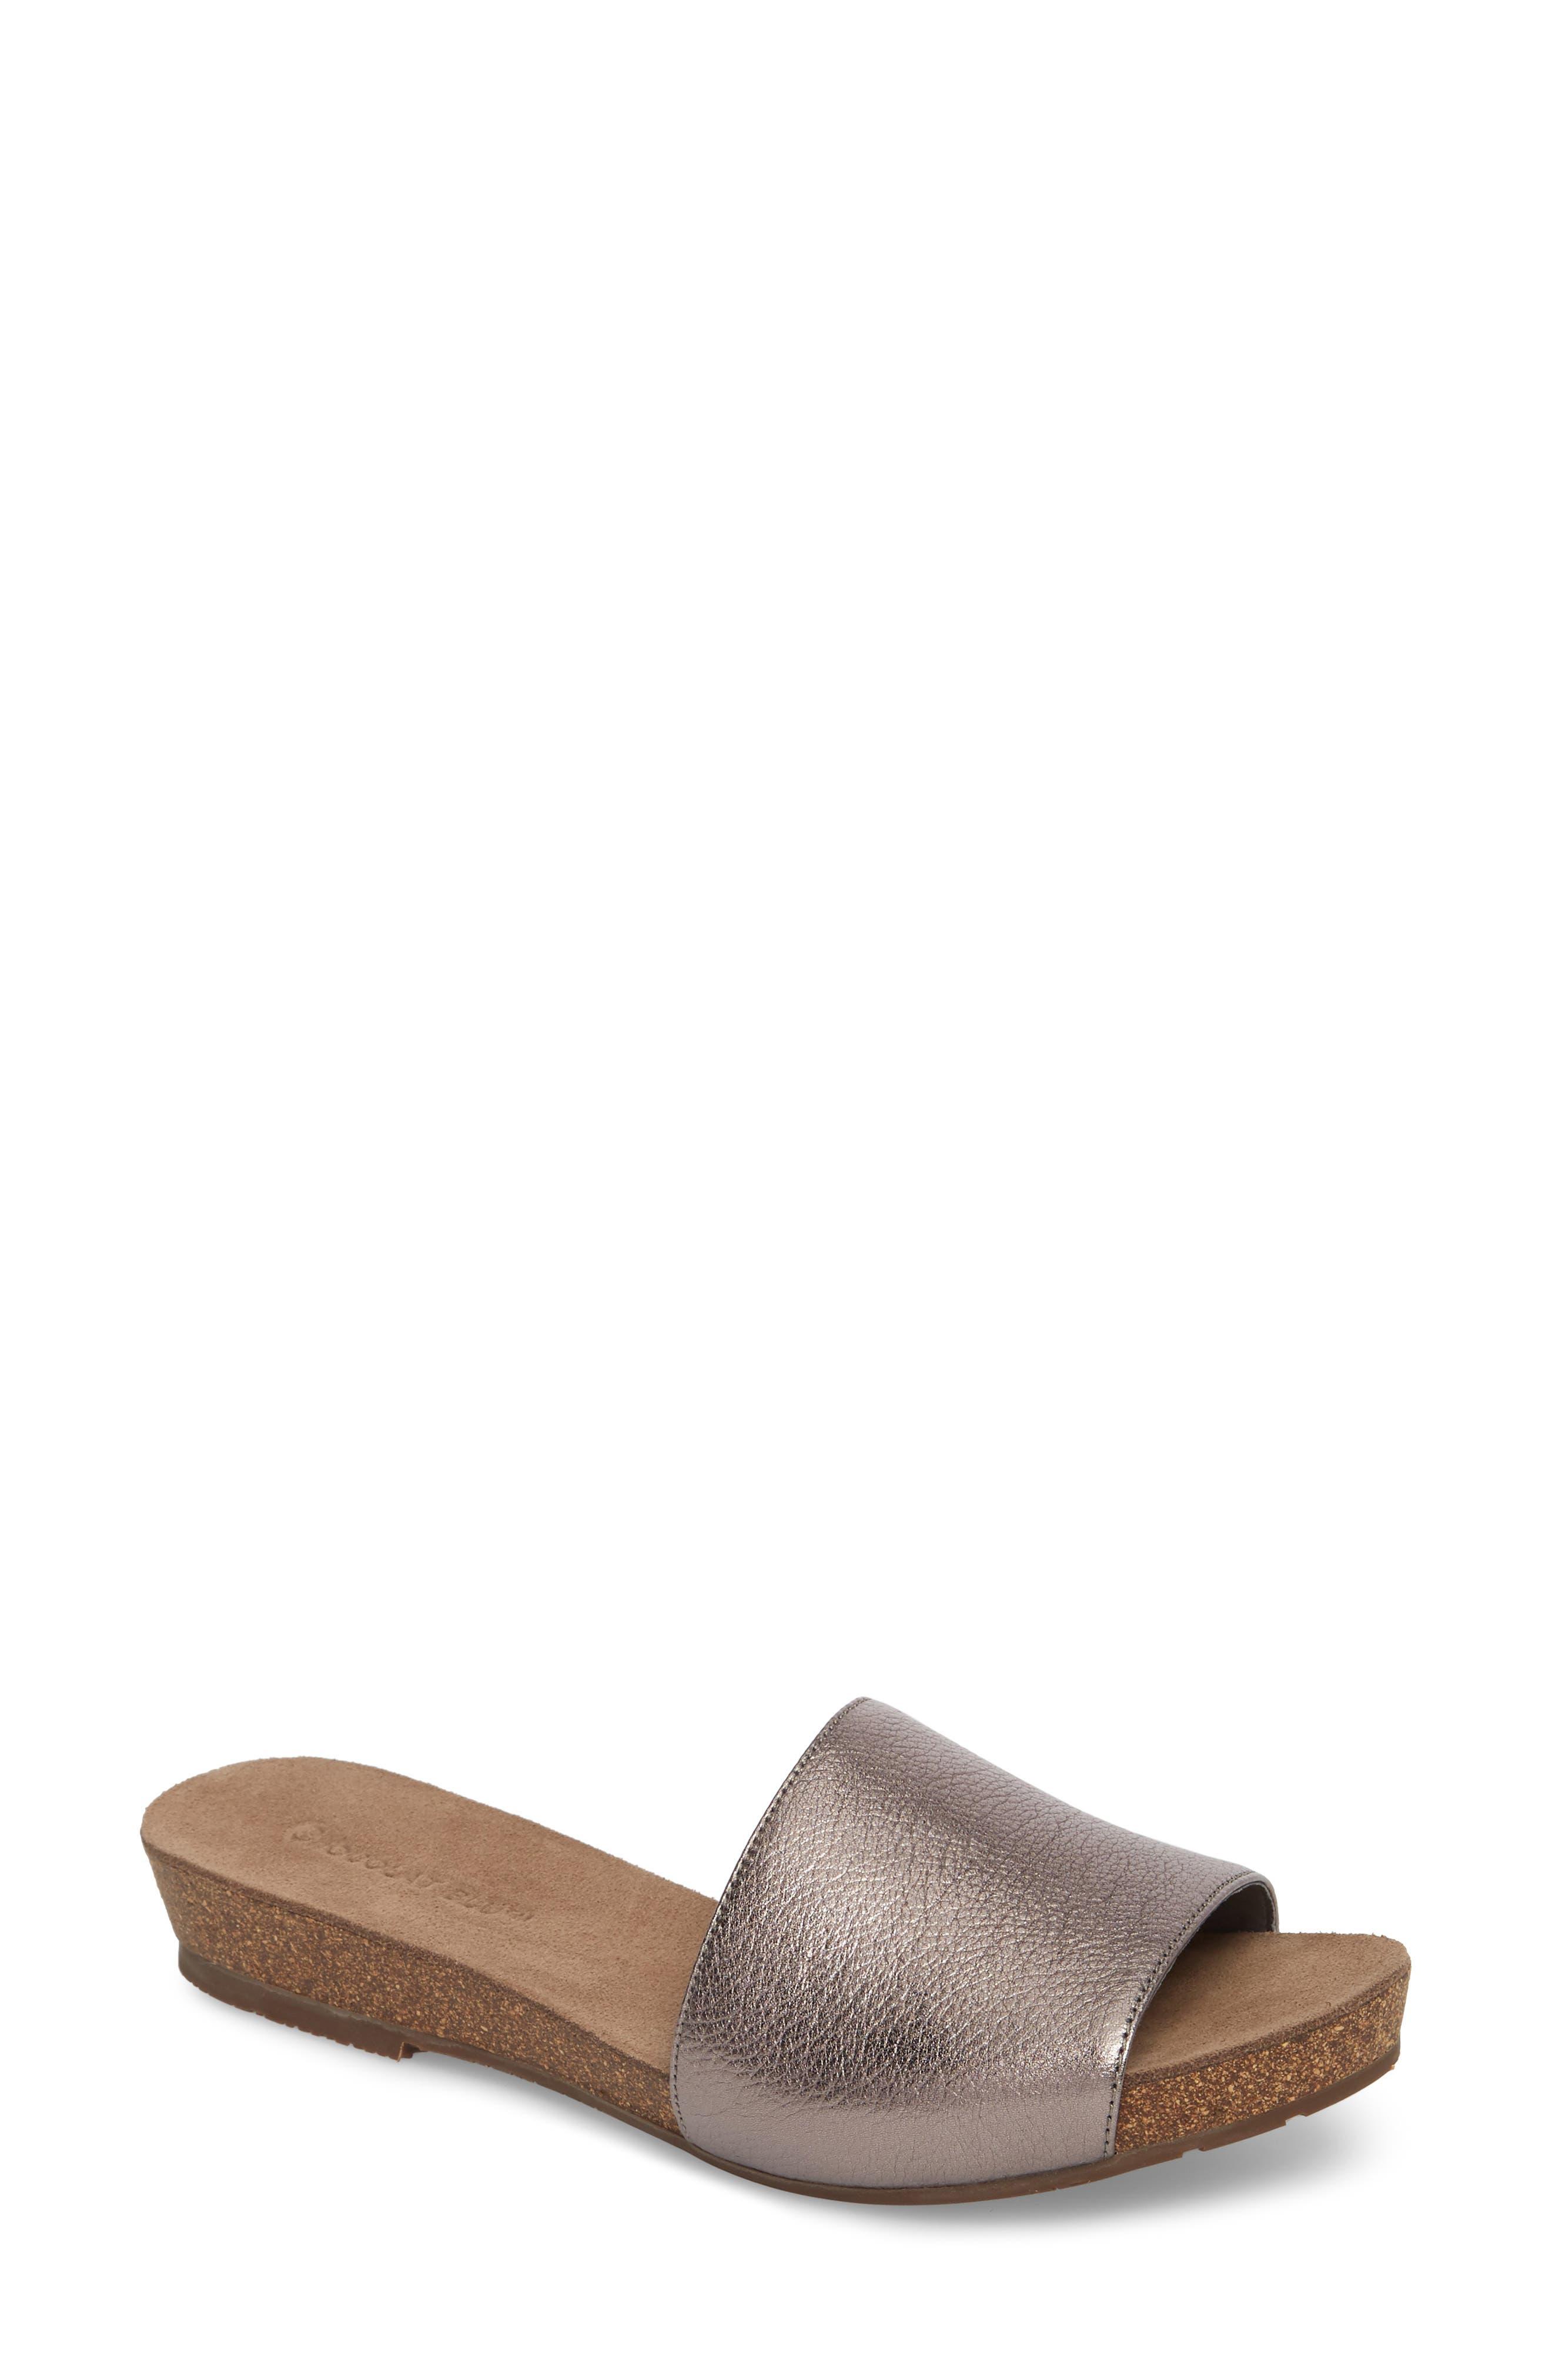 Viveca Slide Sandal,                             Main thumbnail 1, color,                             Gunmetal Leather